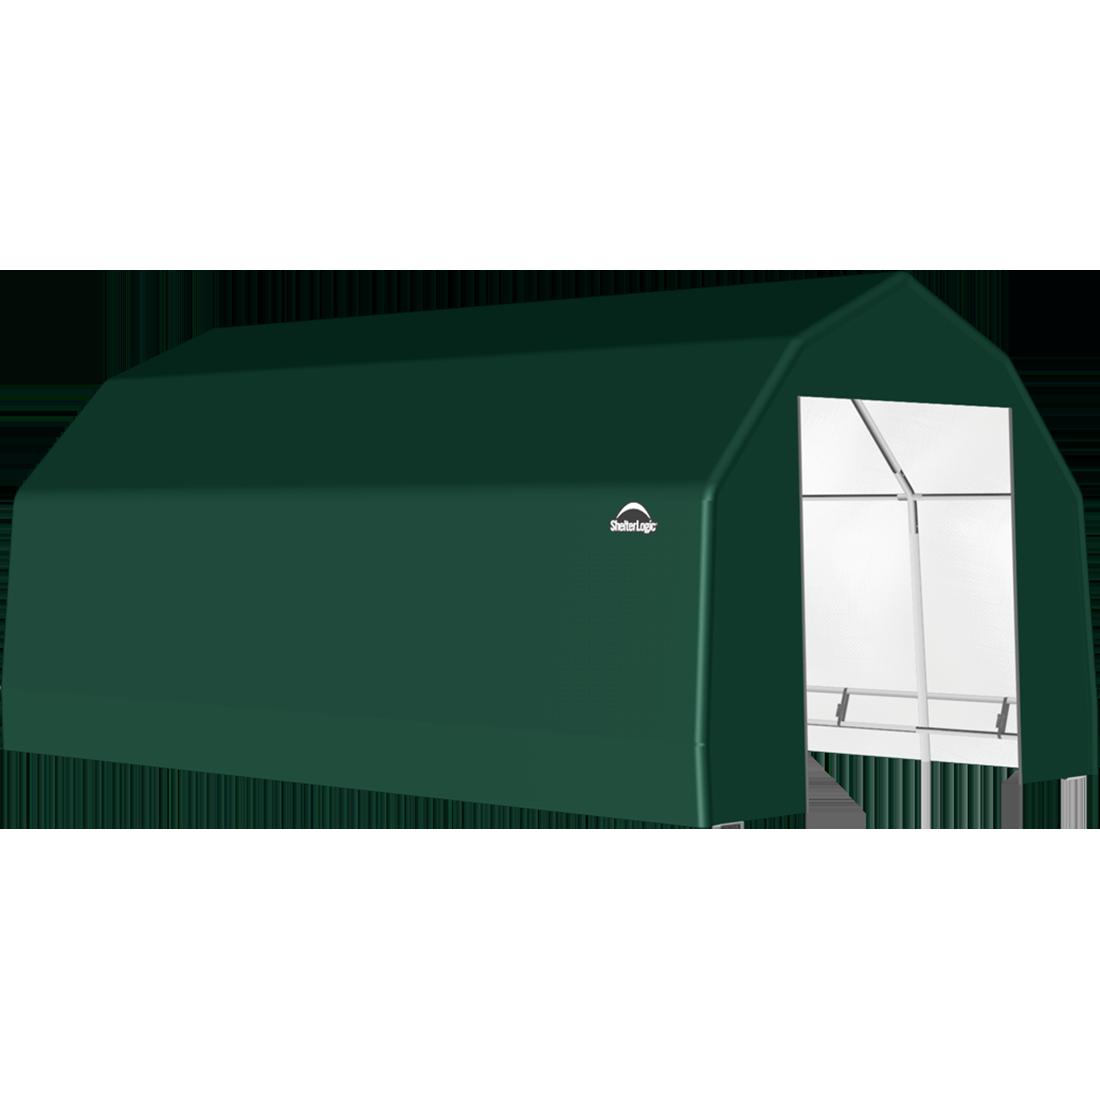 SP Barn 15X20X11 Green 14 oz PE Shelter